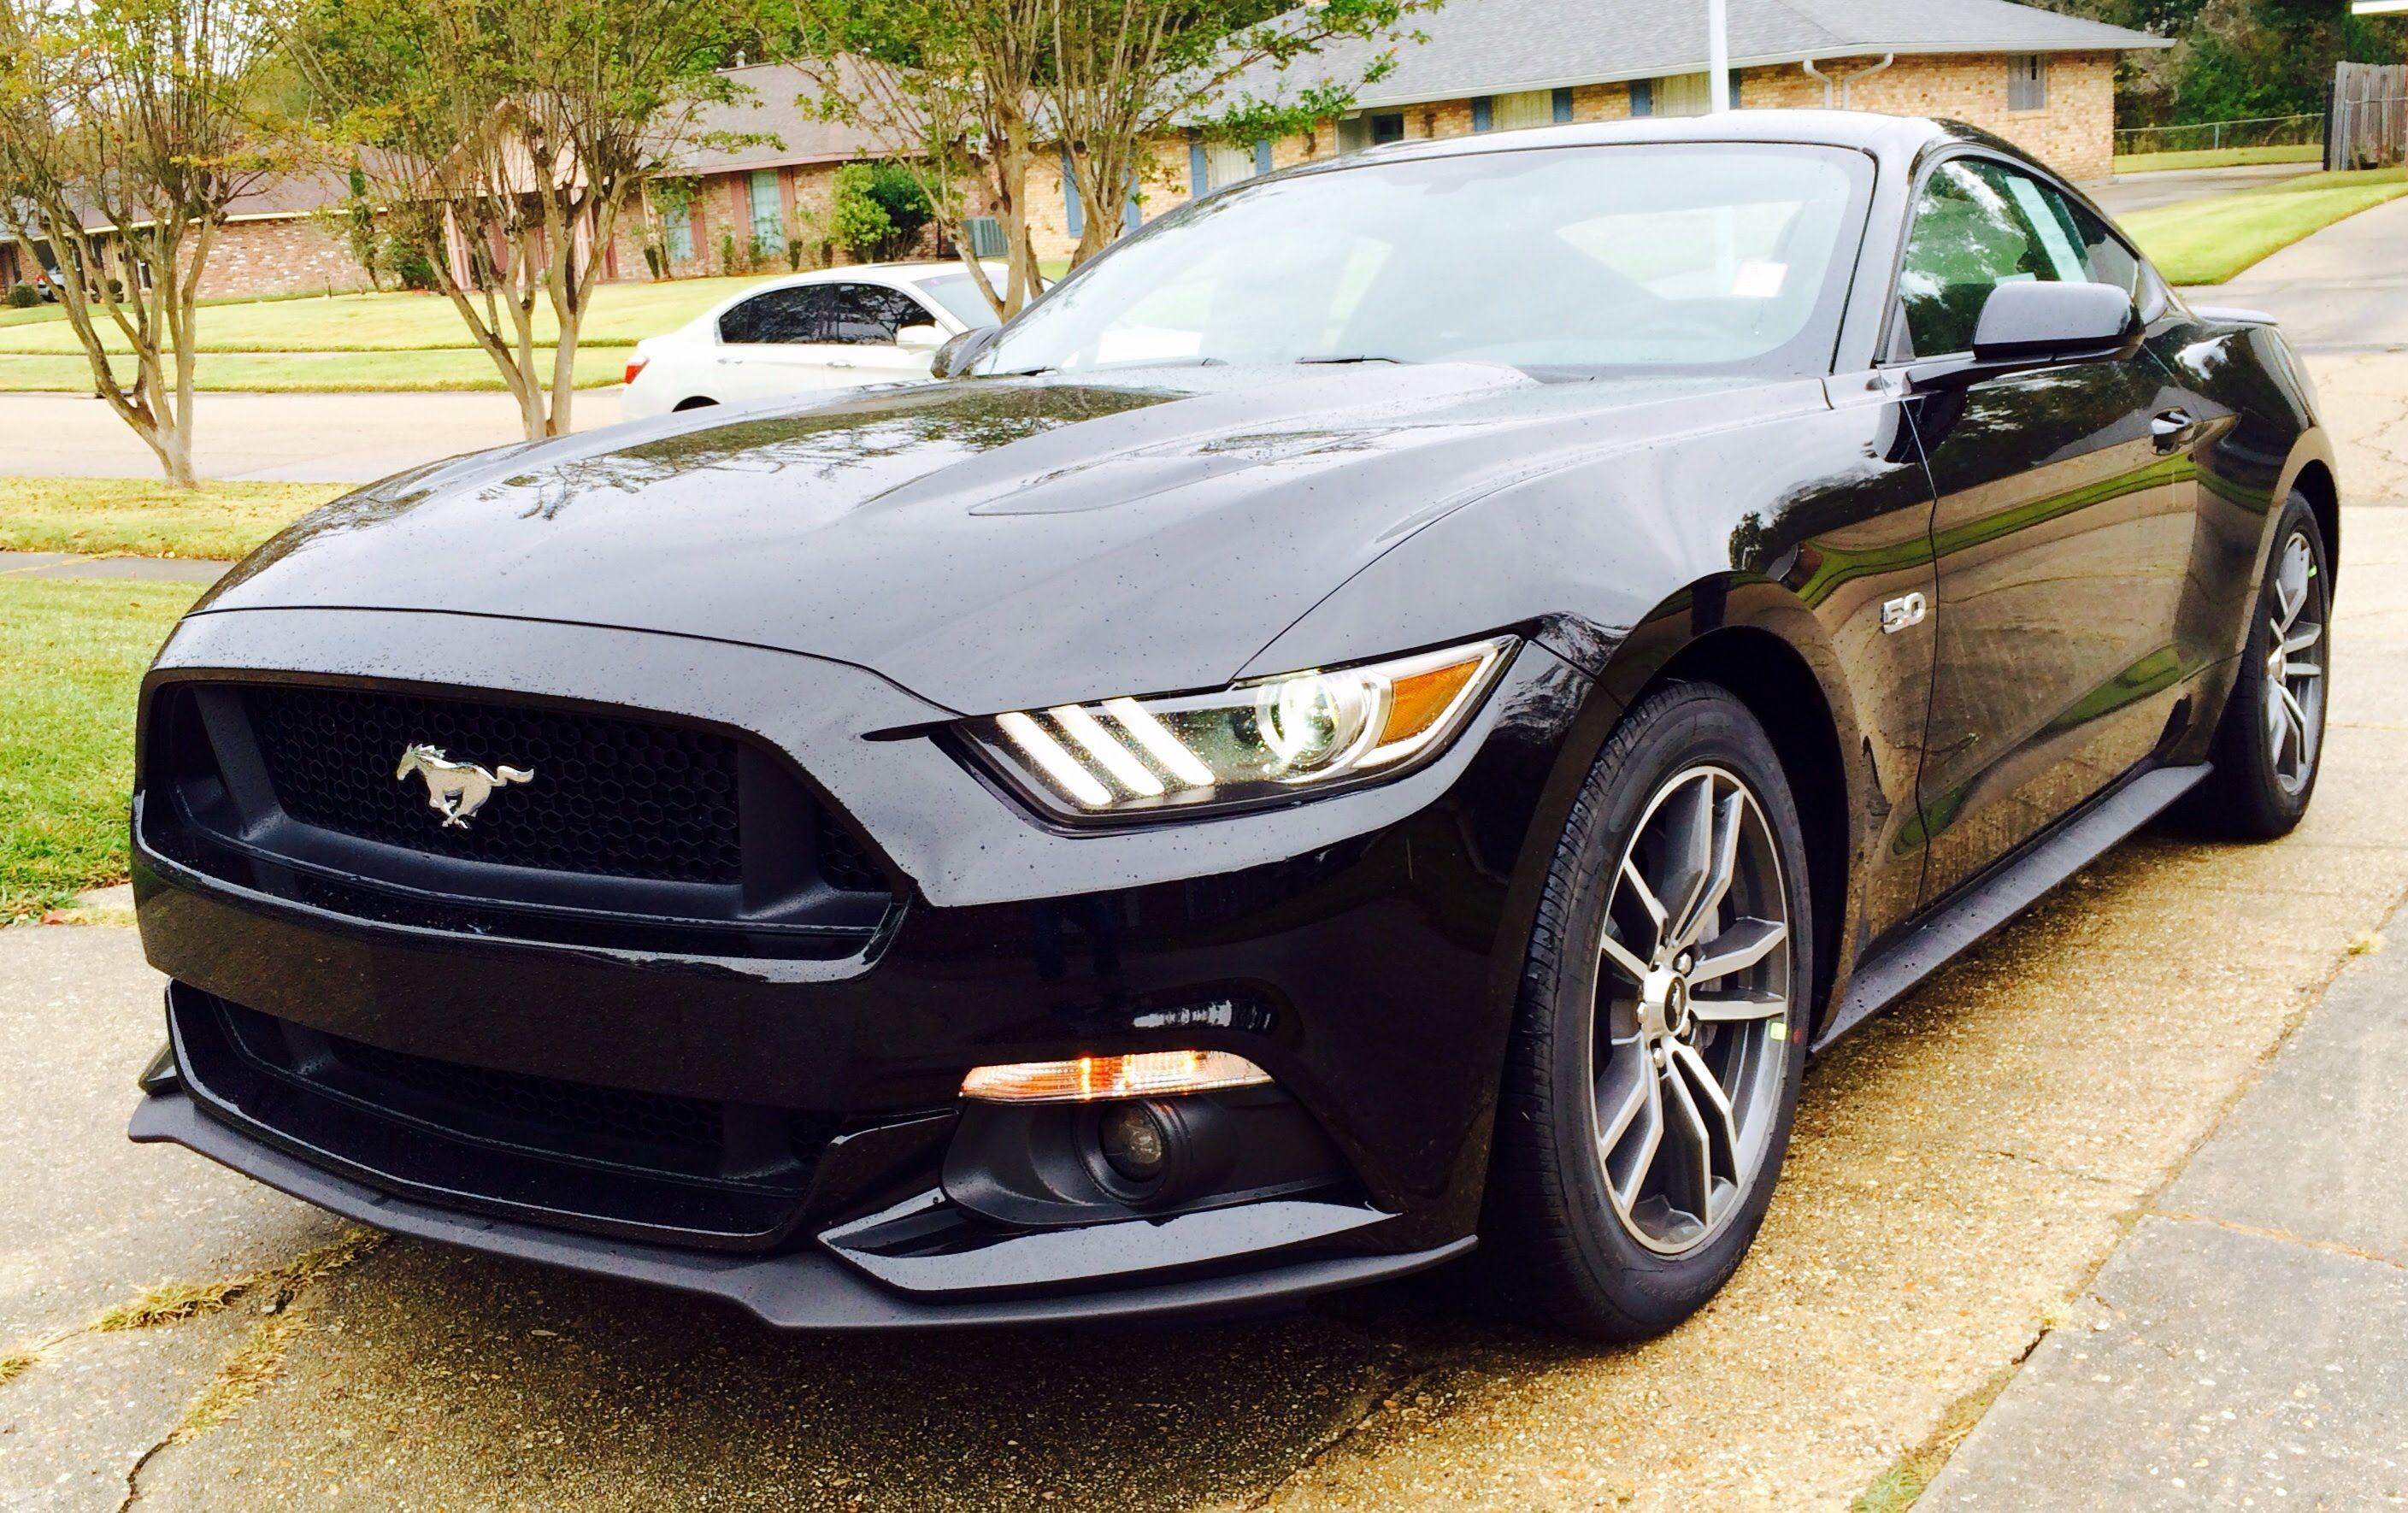 2015 2016 Ford Mustang Gt Fastback 5 0l V8 Full Review Test Drive Ex Ford Mustang 2015 Ford Mustang Ford Mustang Gt